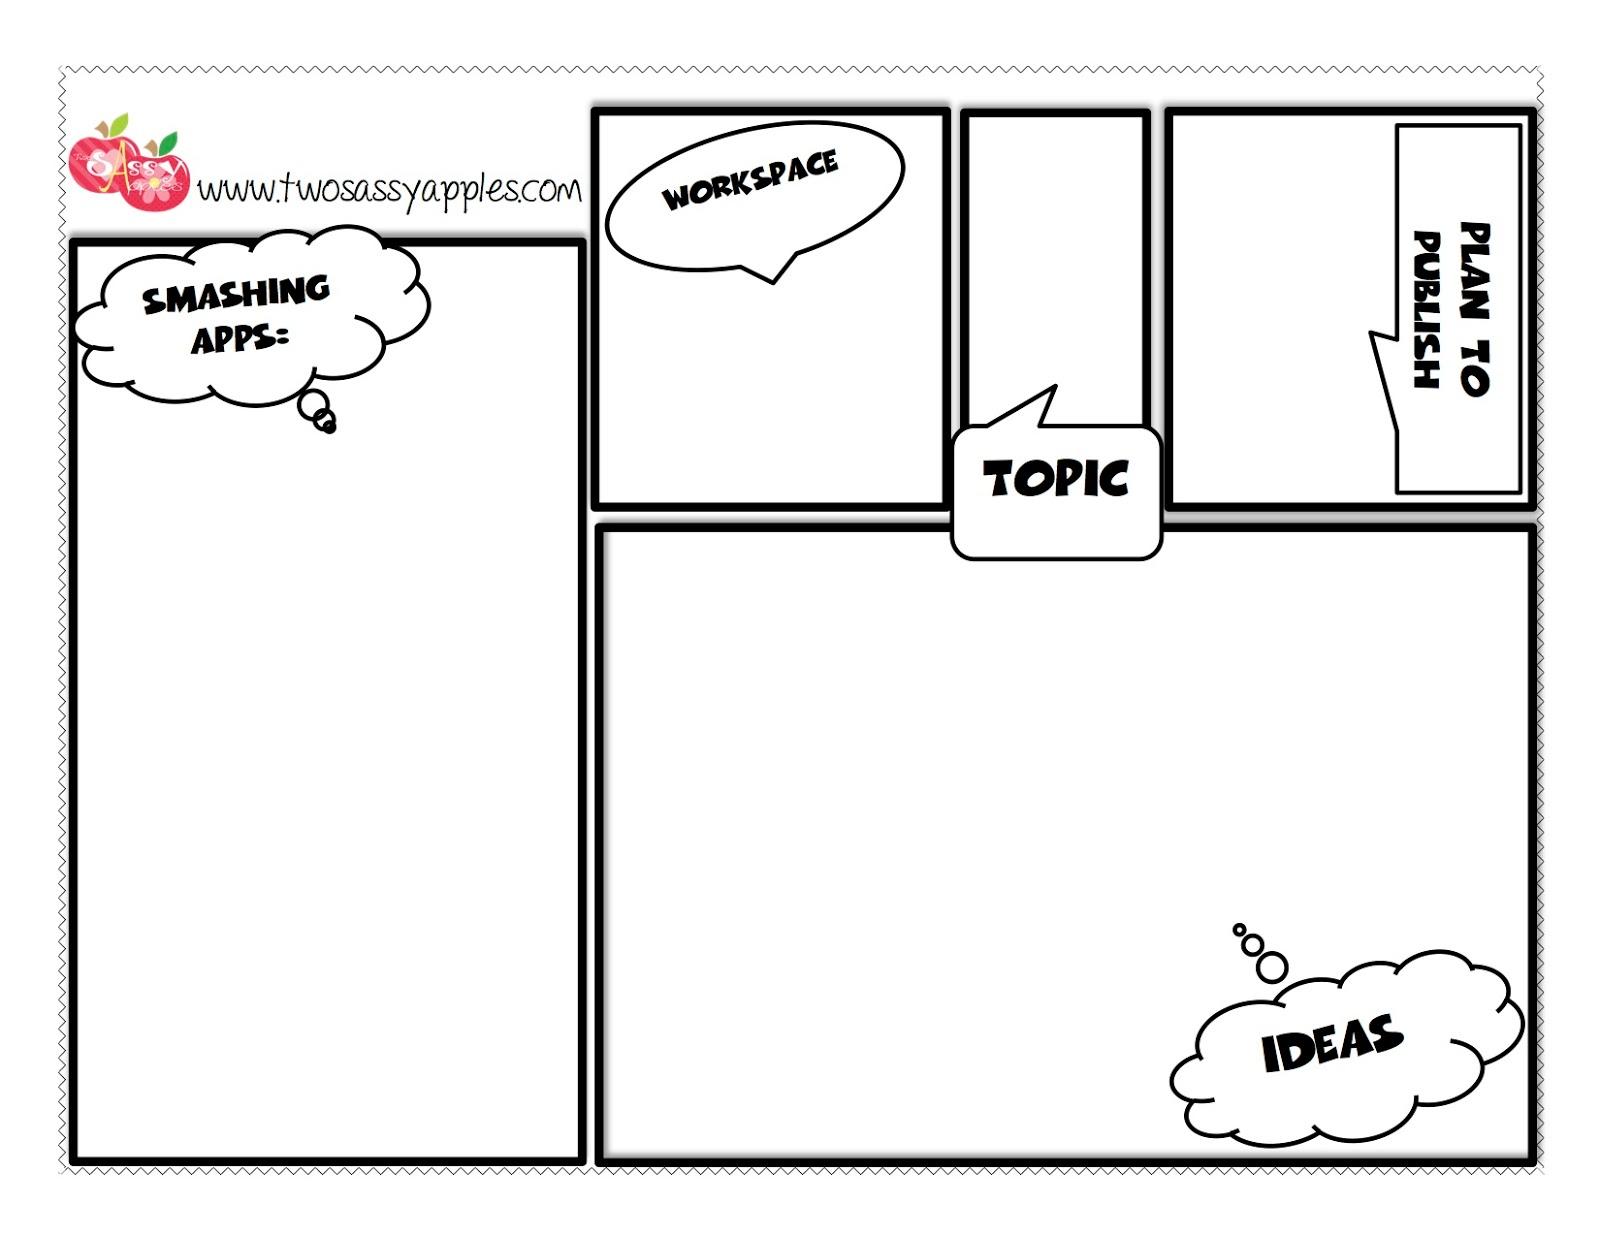 storyboard template app - two sassy apples app smashing